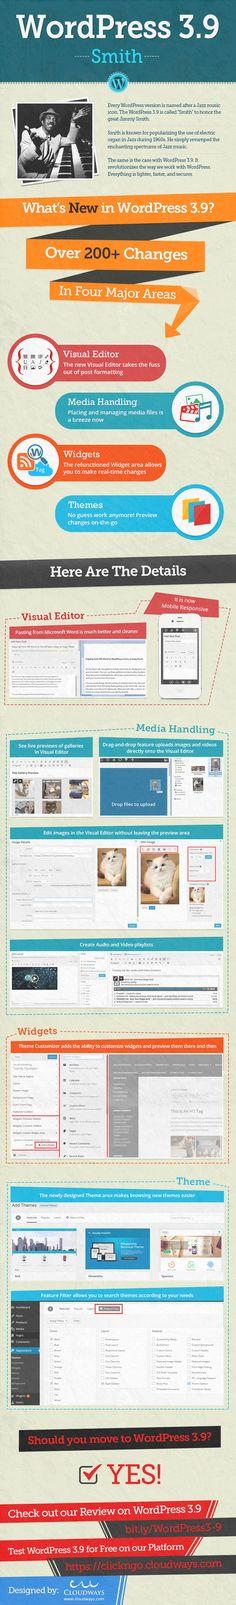 WordPress 3.9 #infografia #infographic #socialmedia